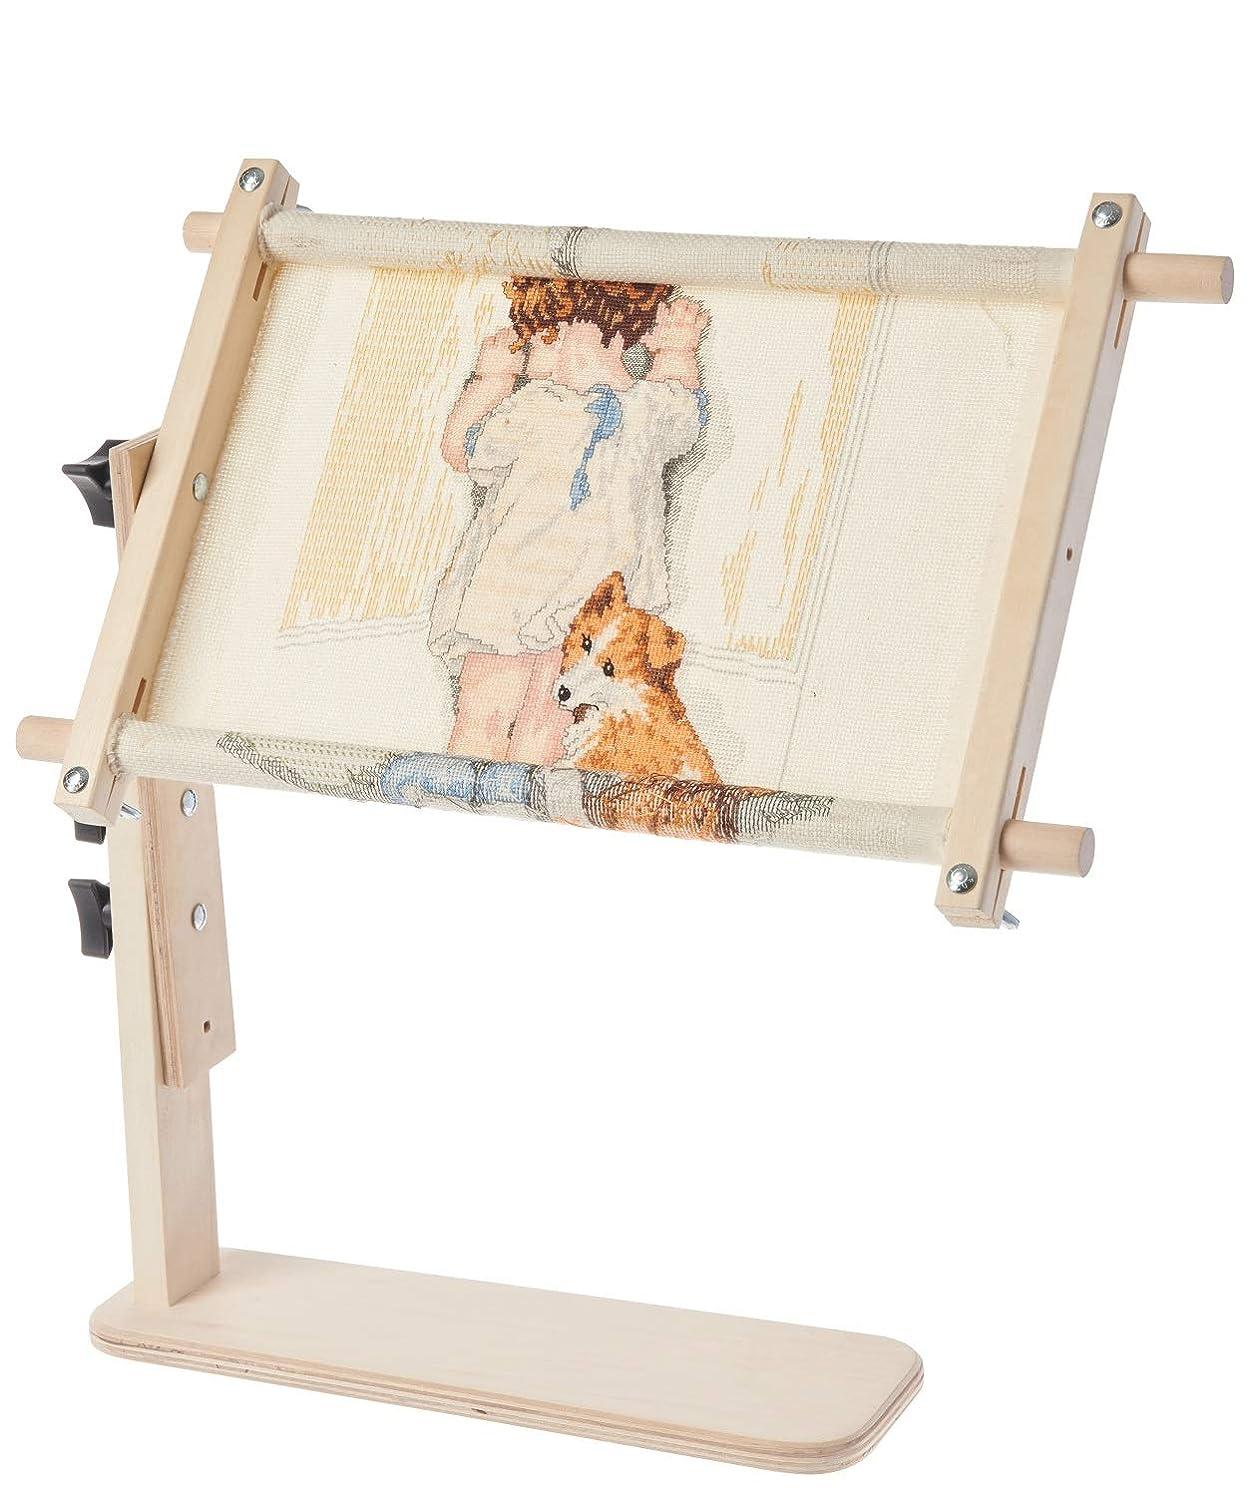 Frank A. Edmunds Sit-On Needlework Frame, 9